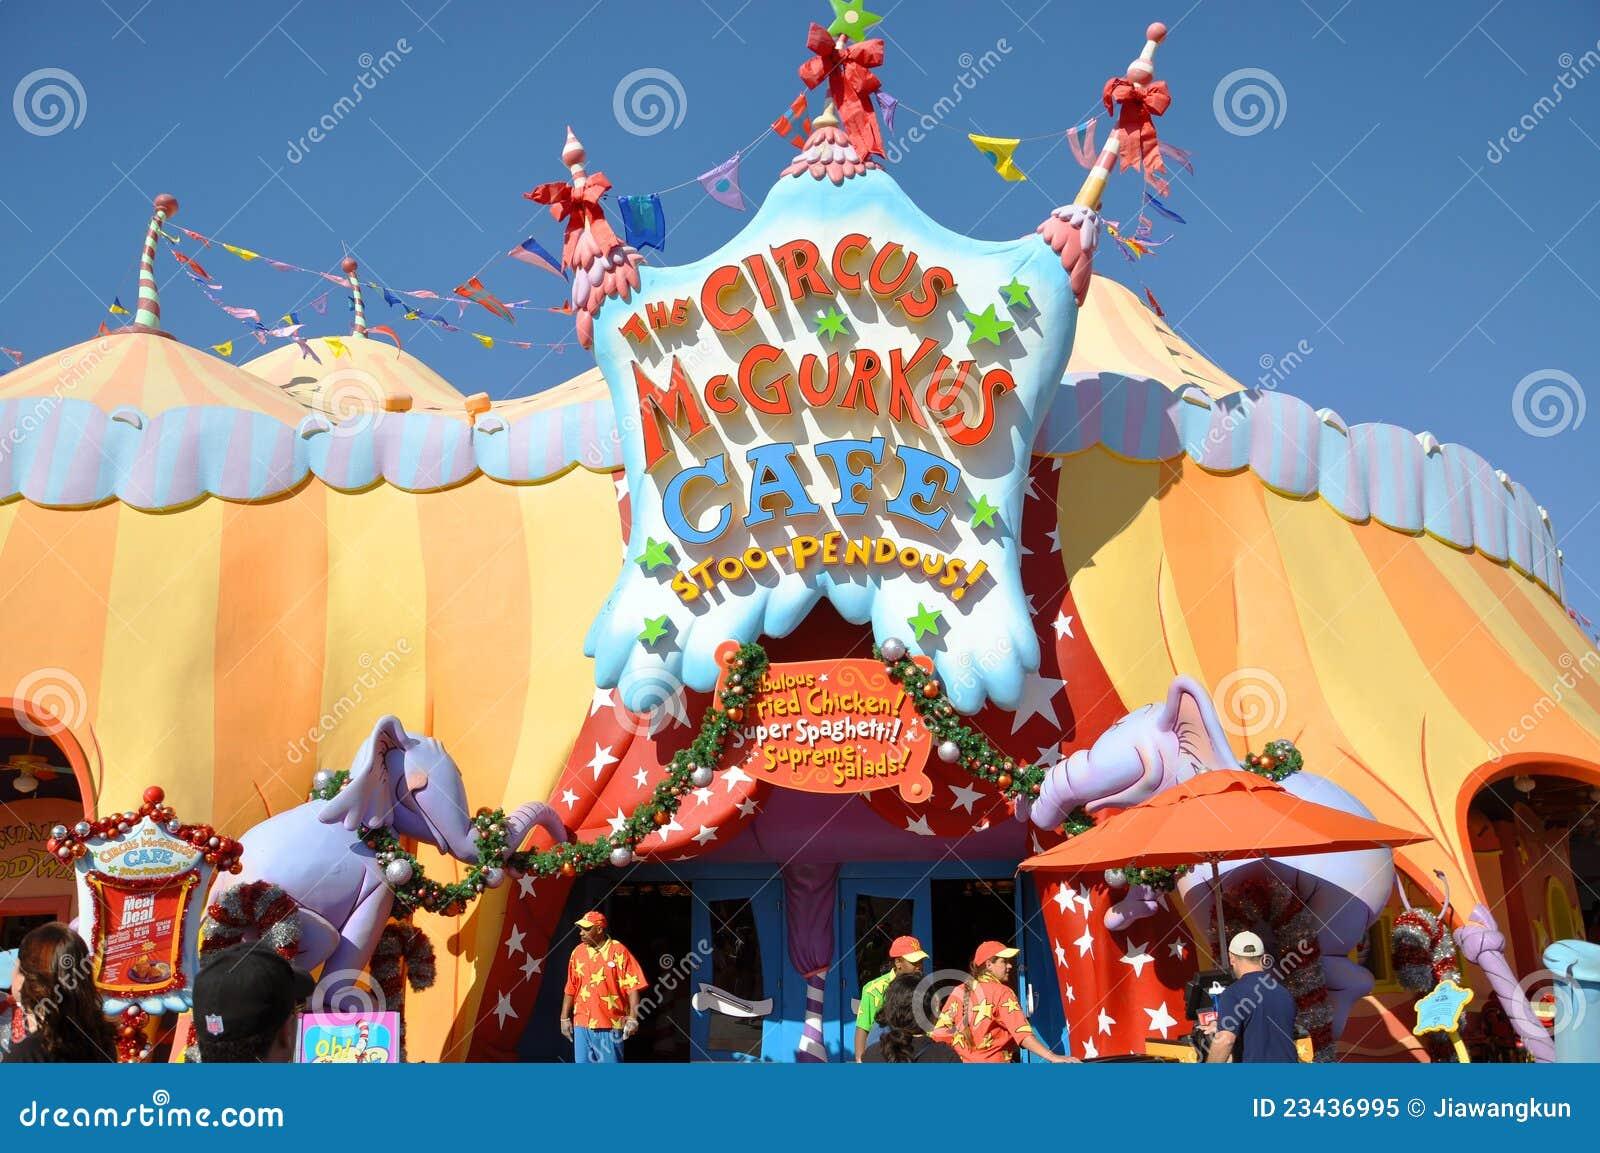 Seuss Landing in Islands of Adventure of Universal Orlando, Florida ...